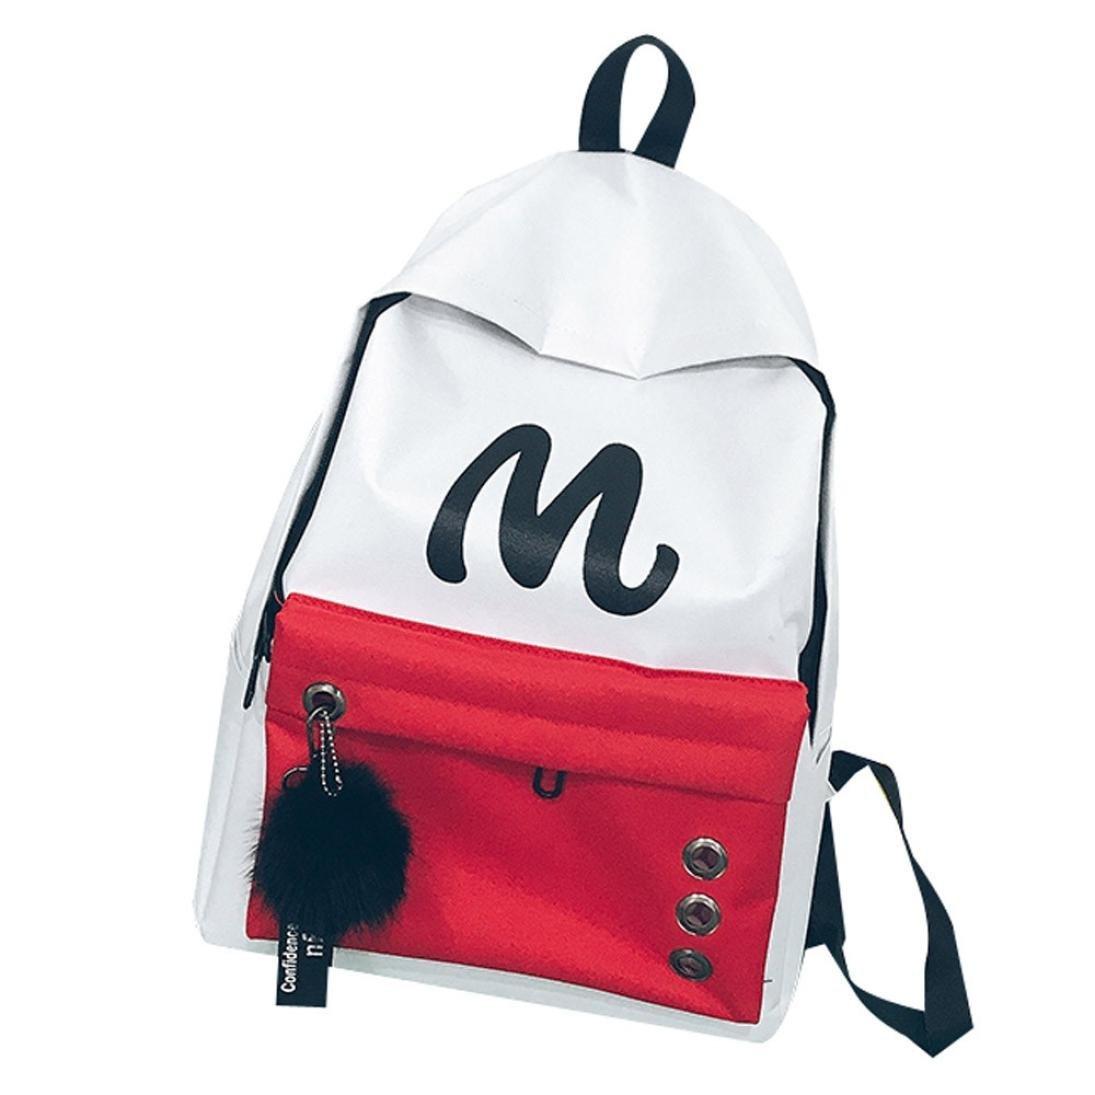 SUKEQ Student Backpack, Unisex Letter Printed Style School Backpack Canvas Bookbag Casual Travel Rucksack Outdoor Travel Daypack (White)